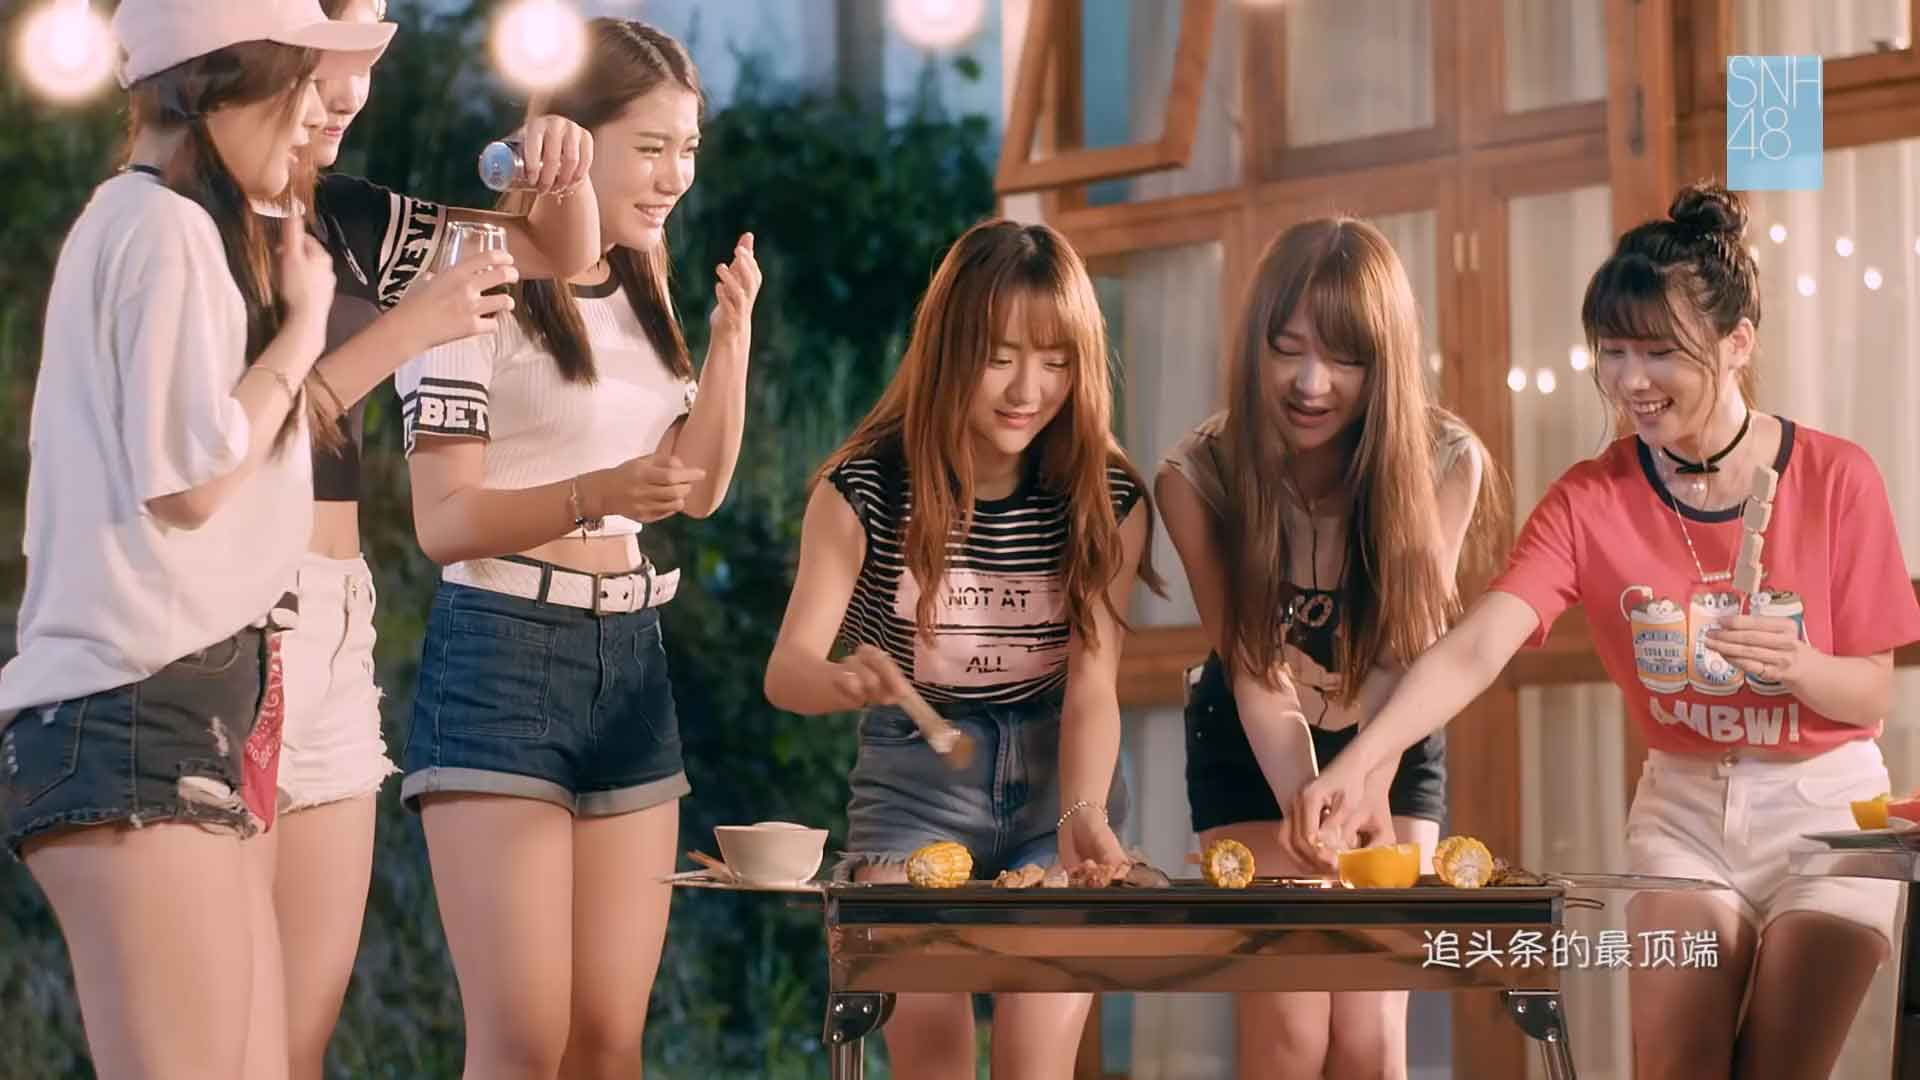 [1080P] - SNH48 - 潮流冠军  正式版 官方HD-MV